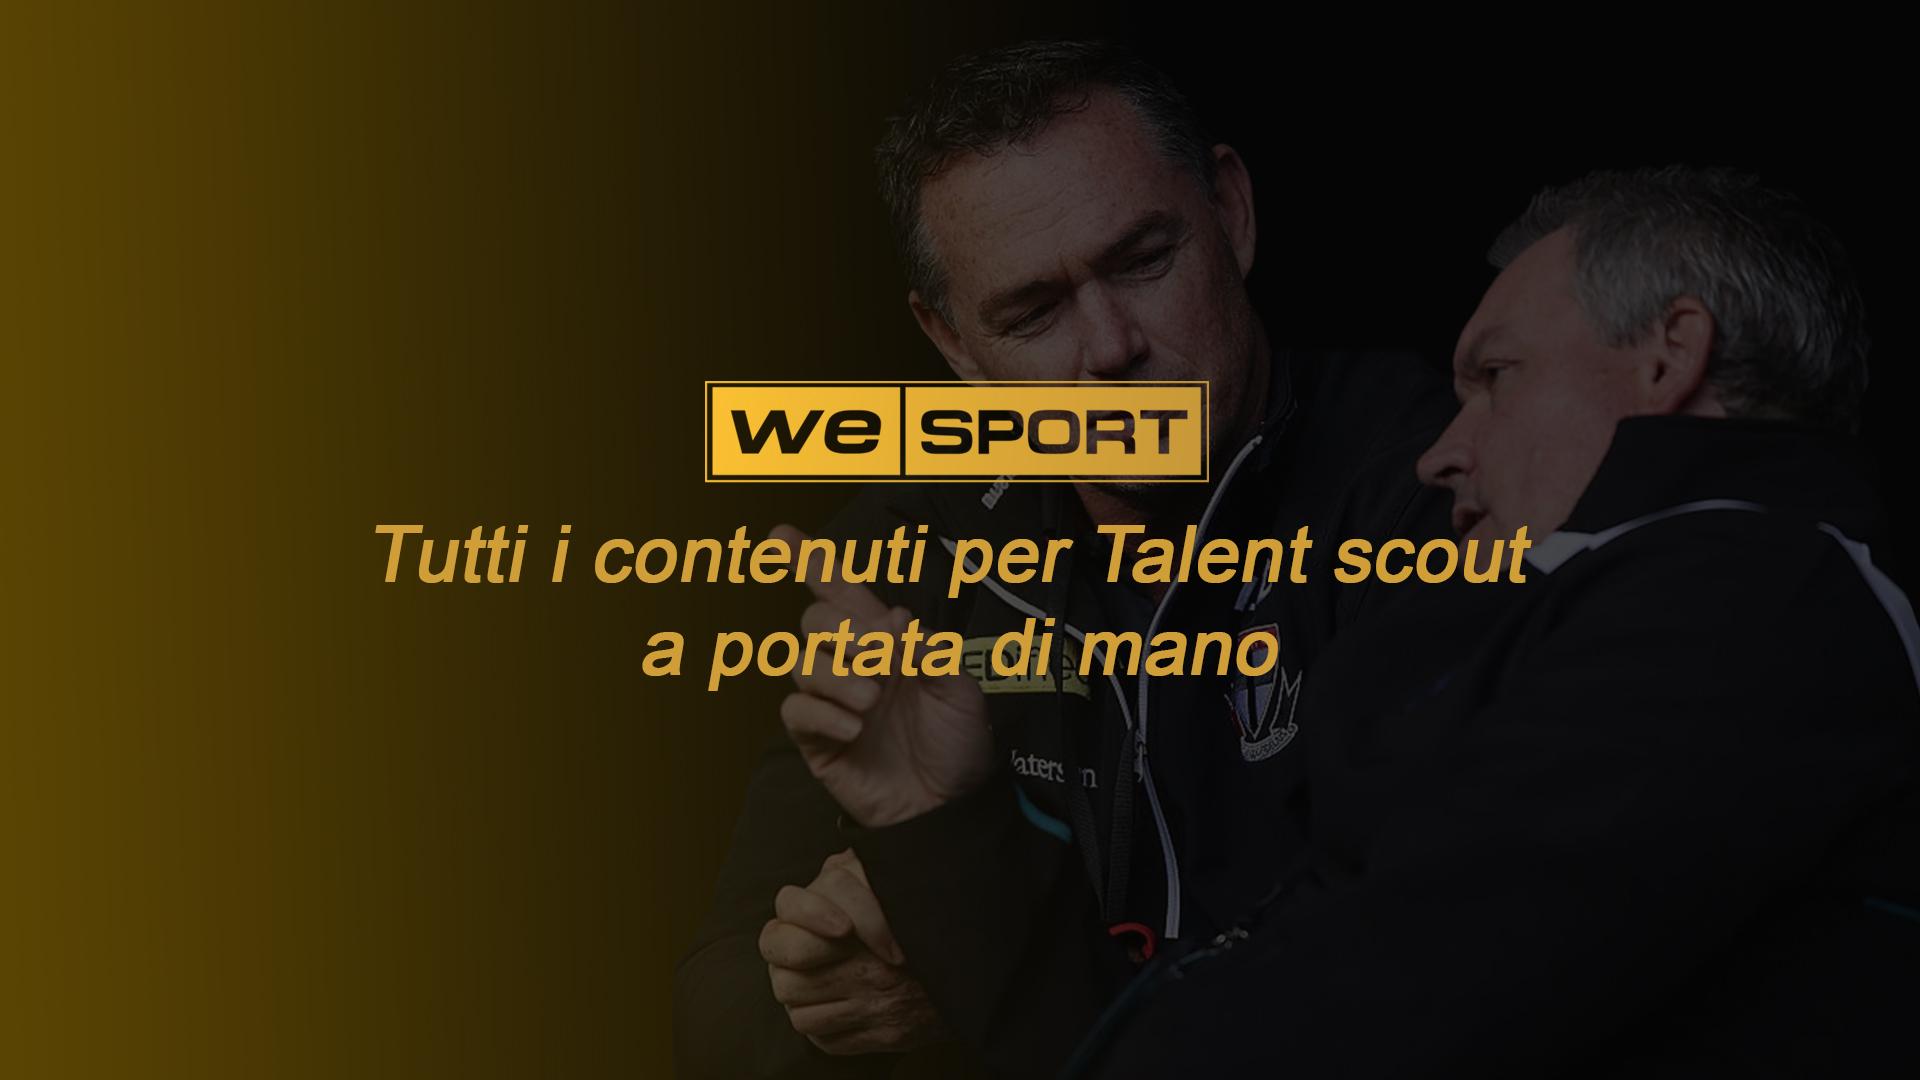 servizi per talent scout We Sport